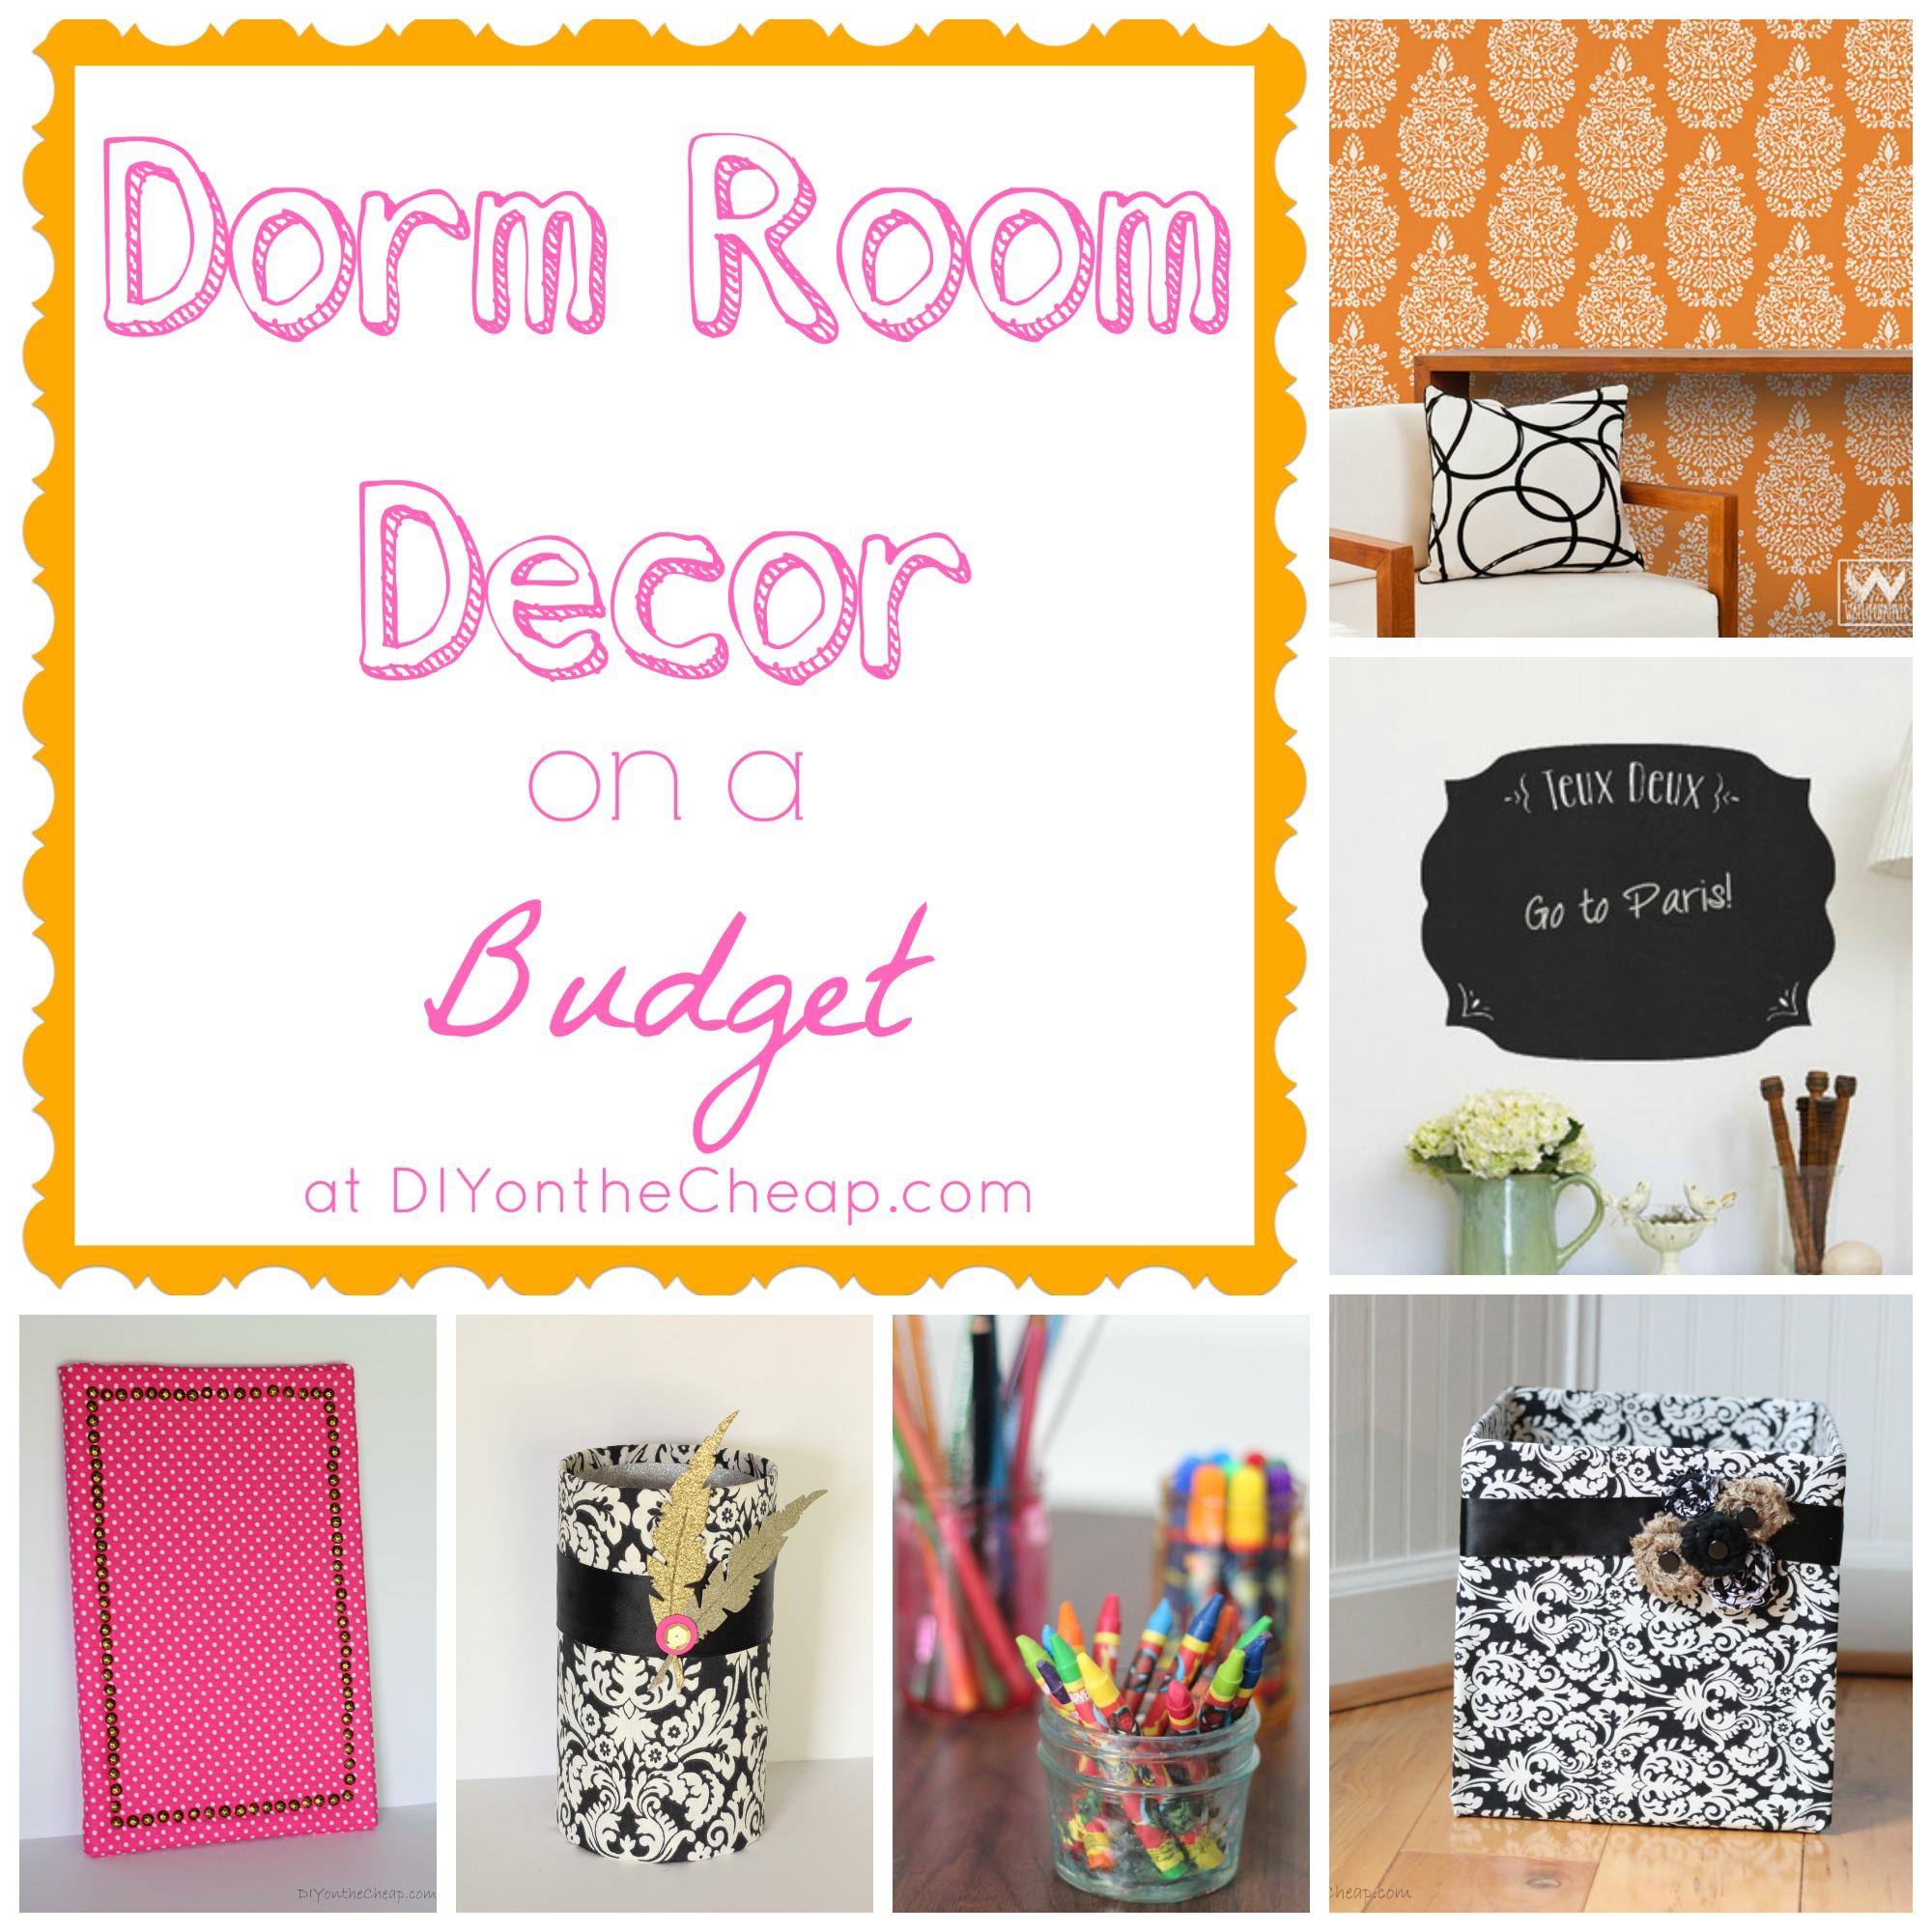 dorm room decor ideas erin spain. Black Bedroom Furniture Sets. Home Design Ideas